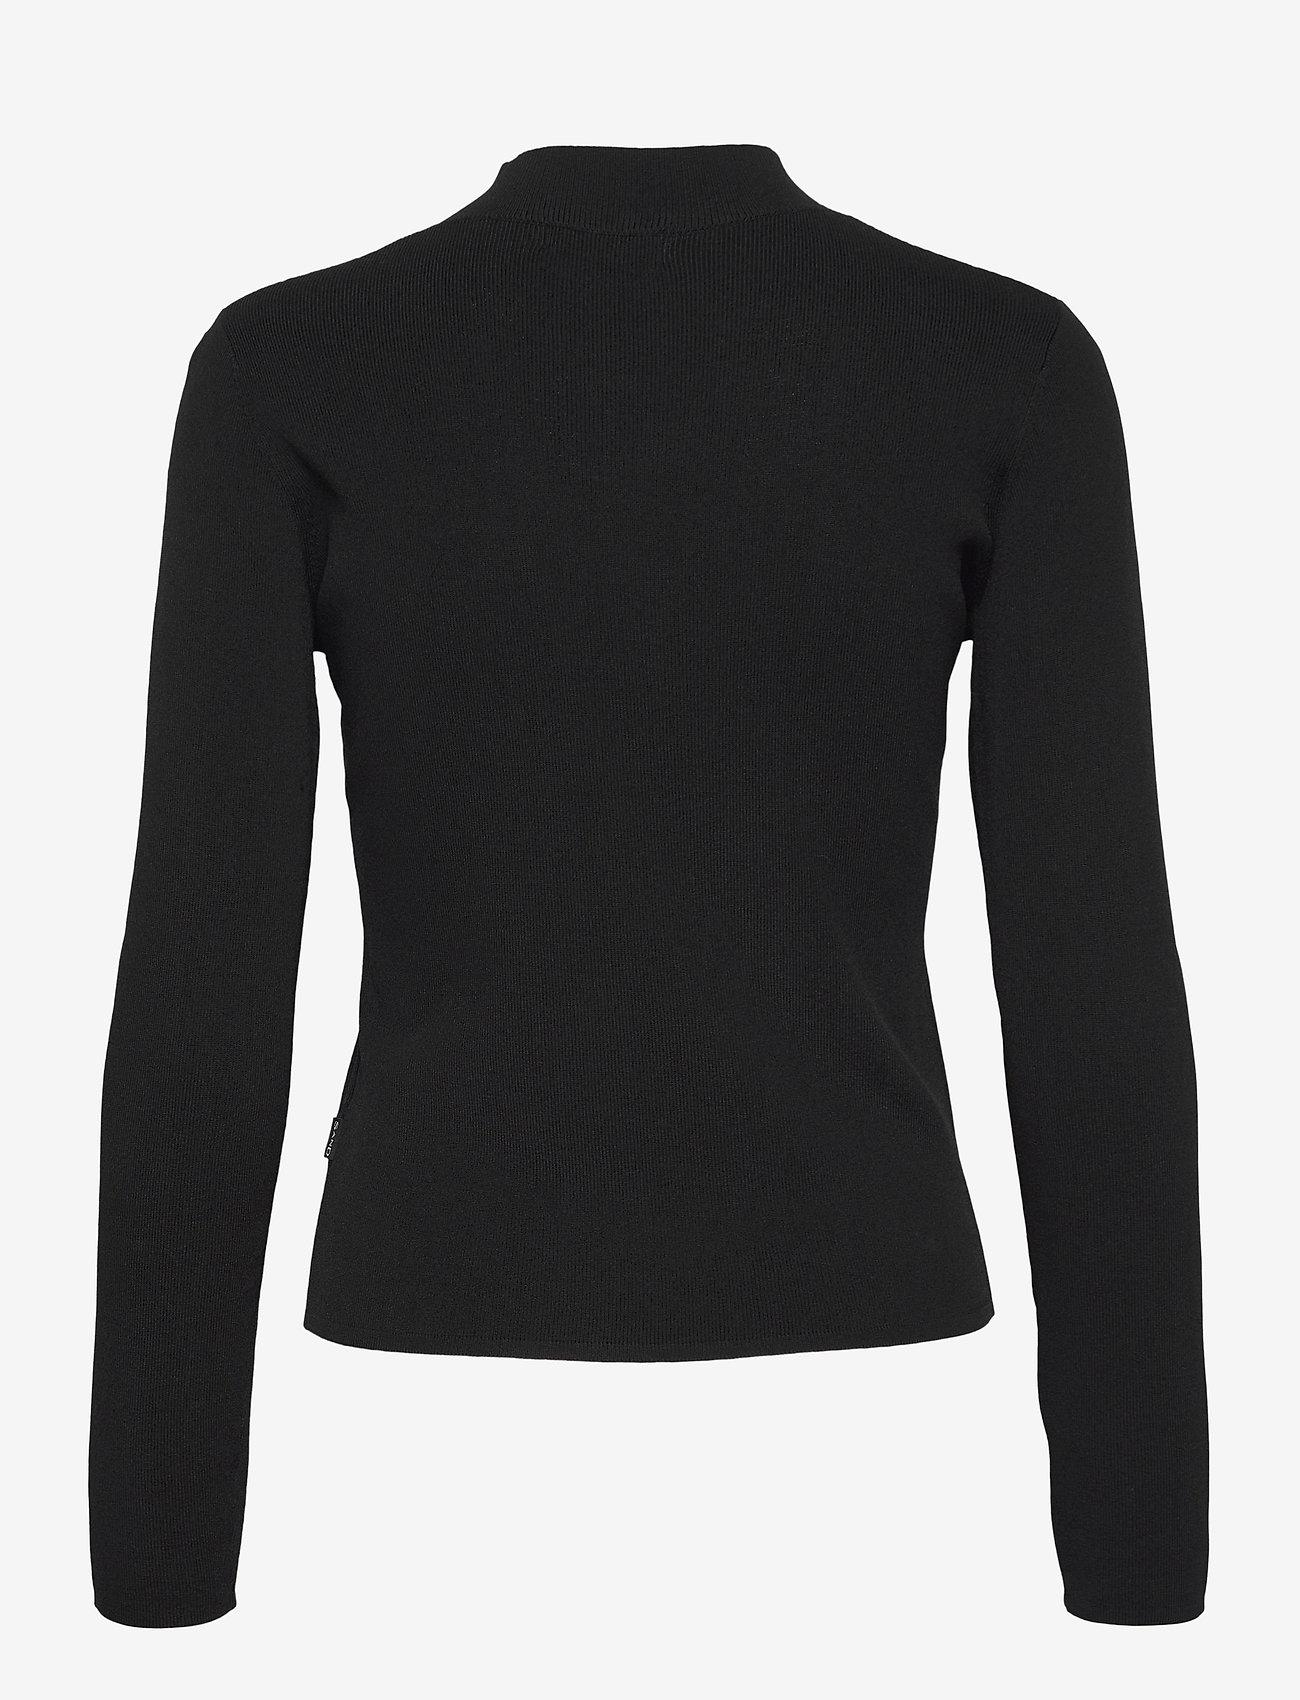 SAND - 5181 - Della Zip - cardigans - black - 1